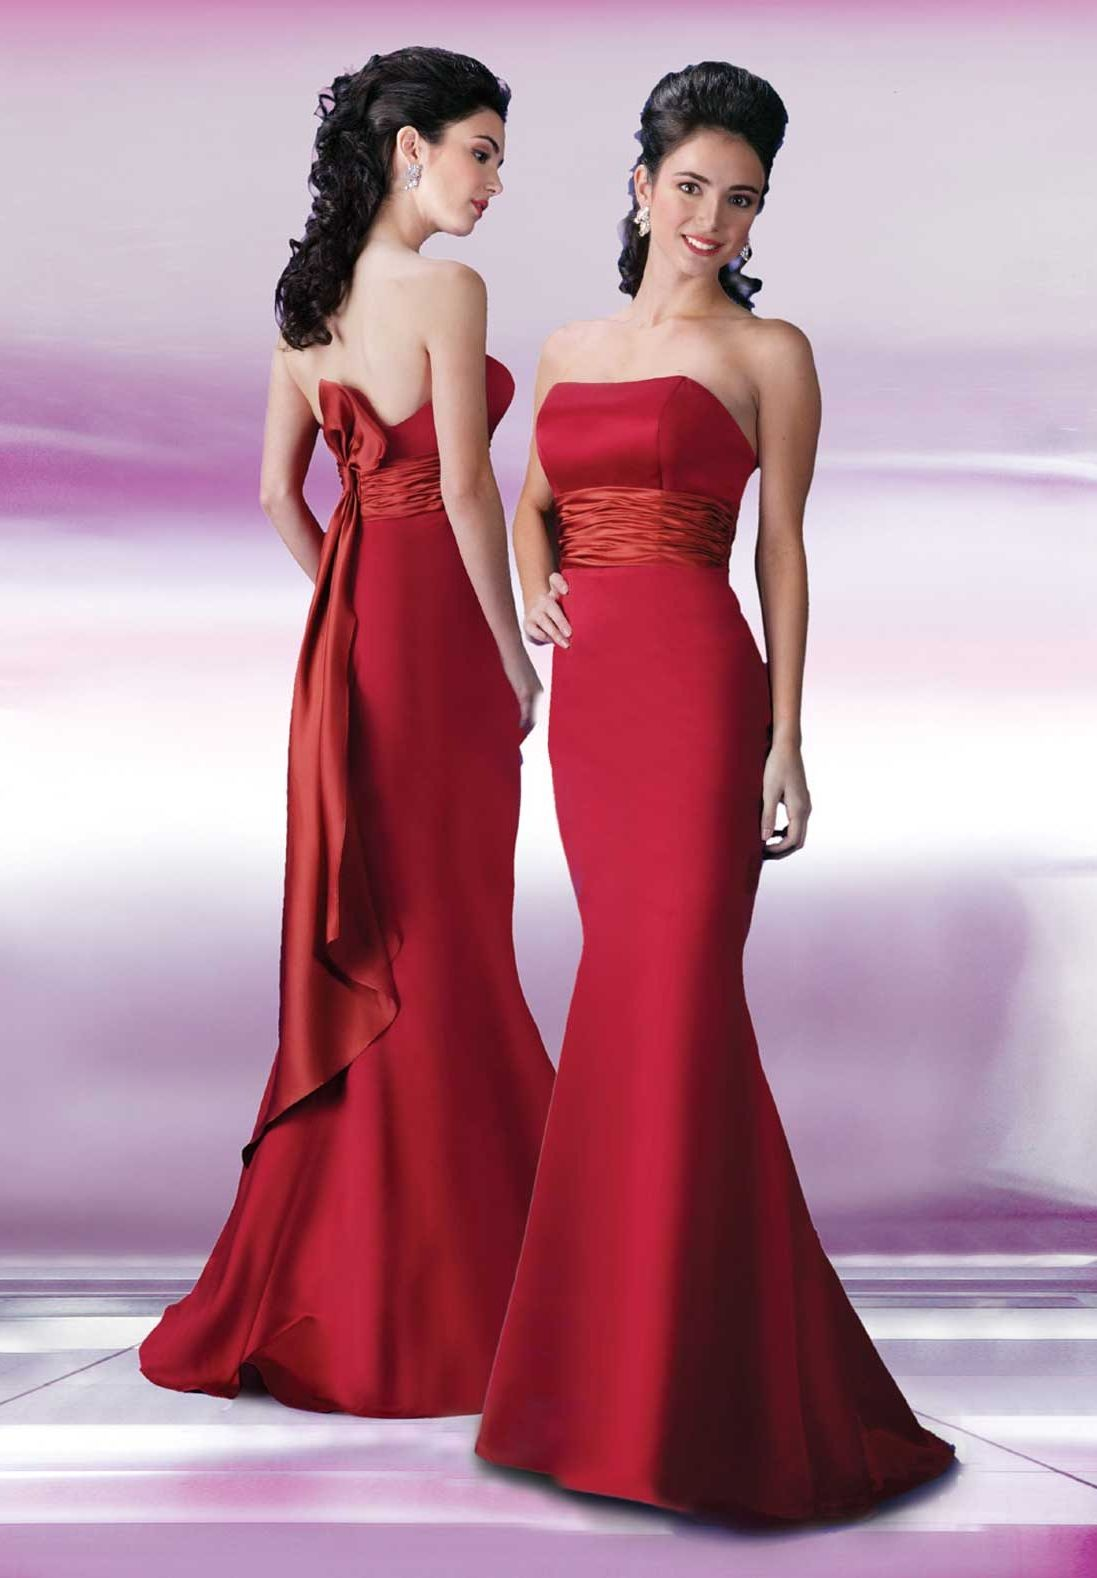 WhiteAzalea Destination Dresses Red color Accents on